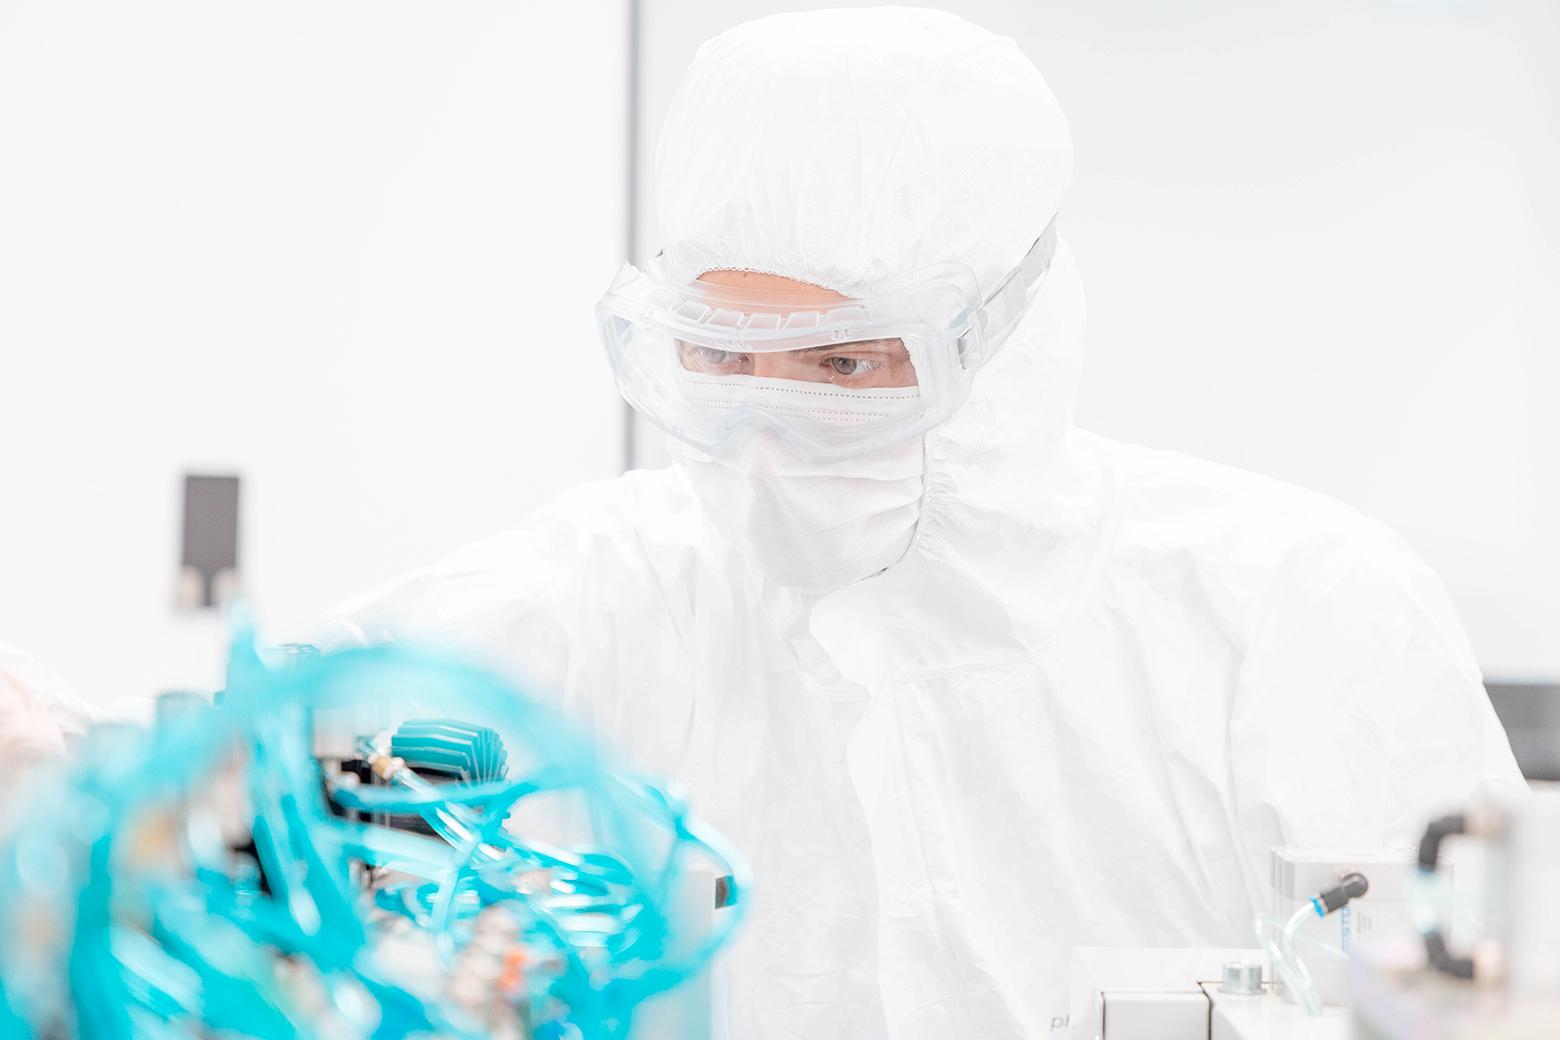 Operatore Cleanroom Pharmaclean